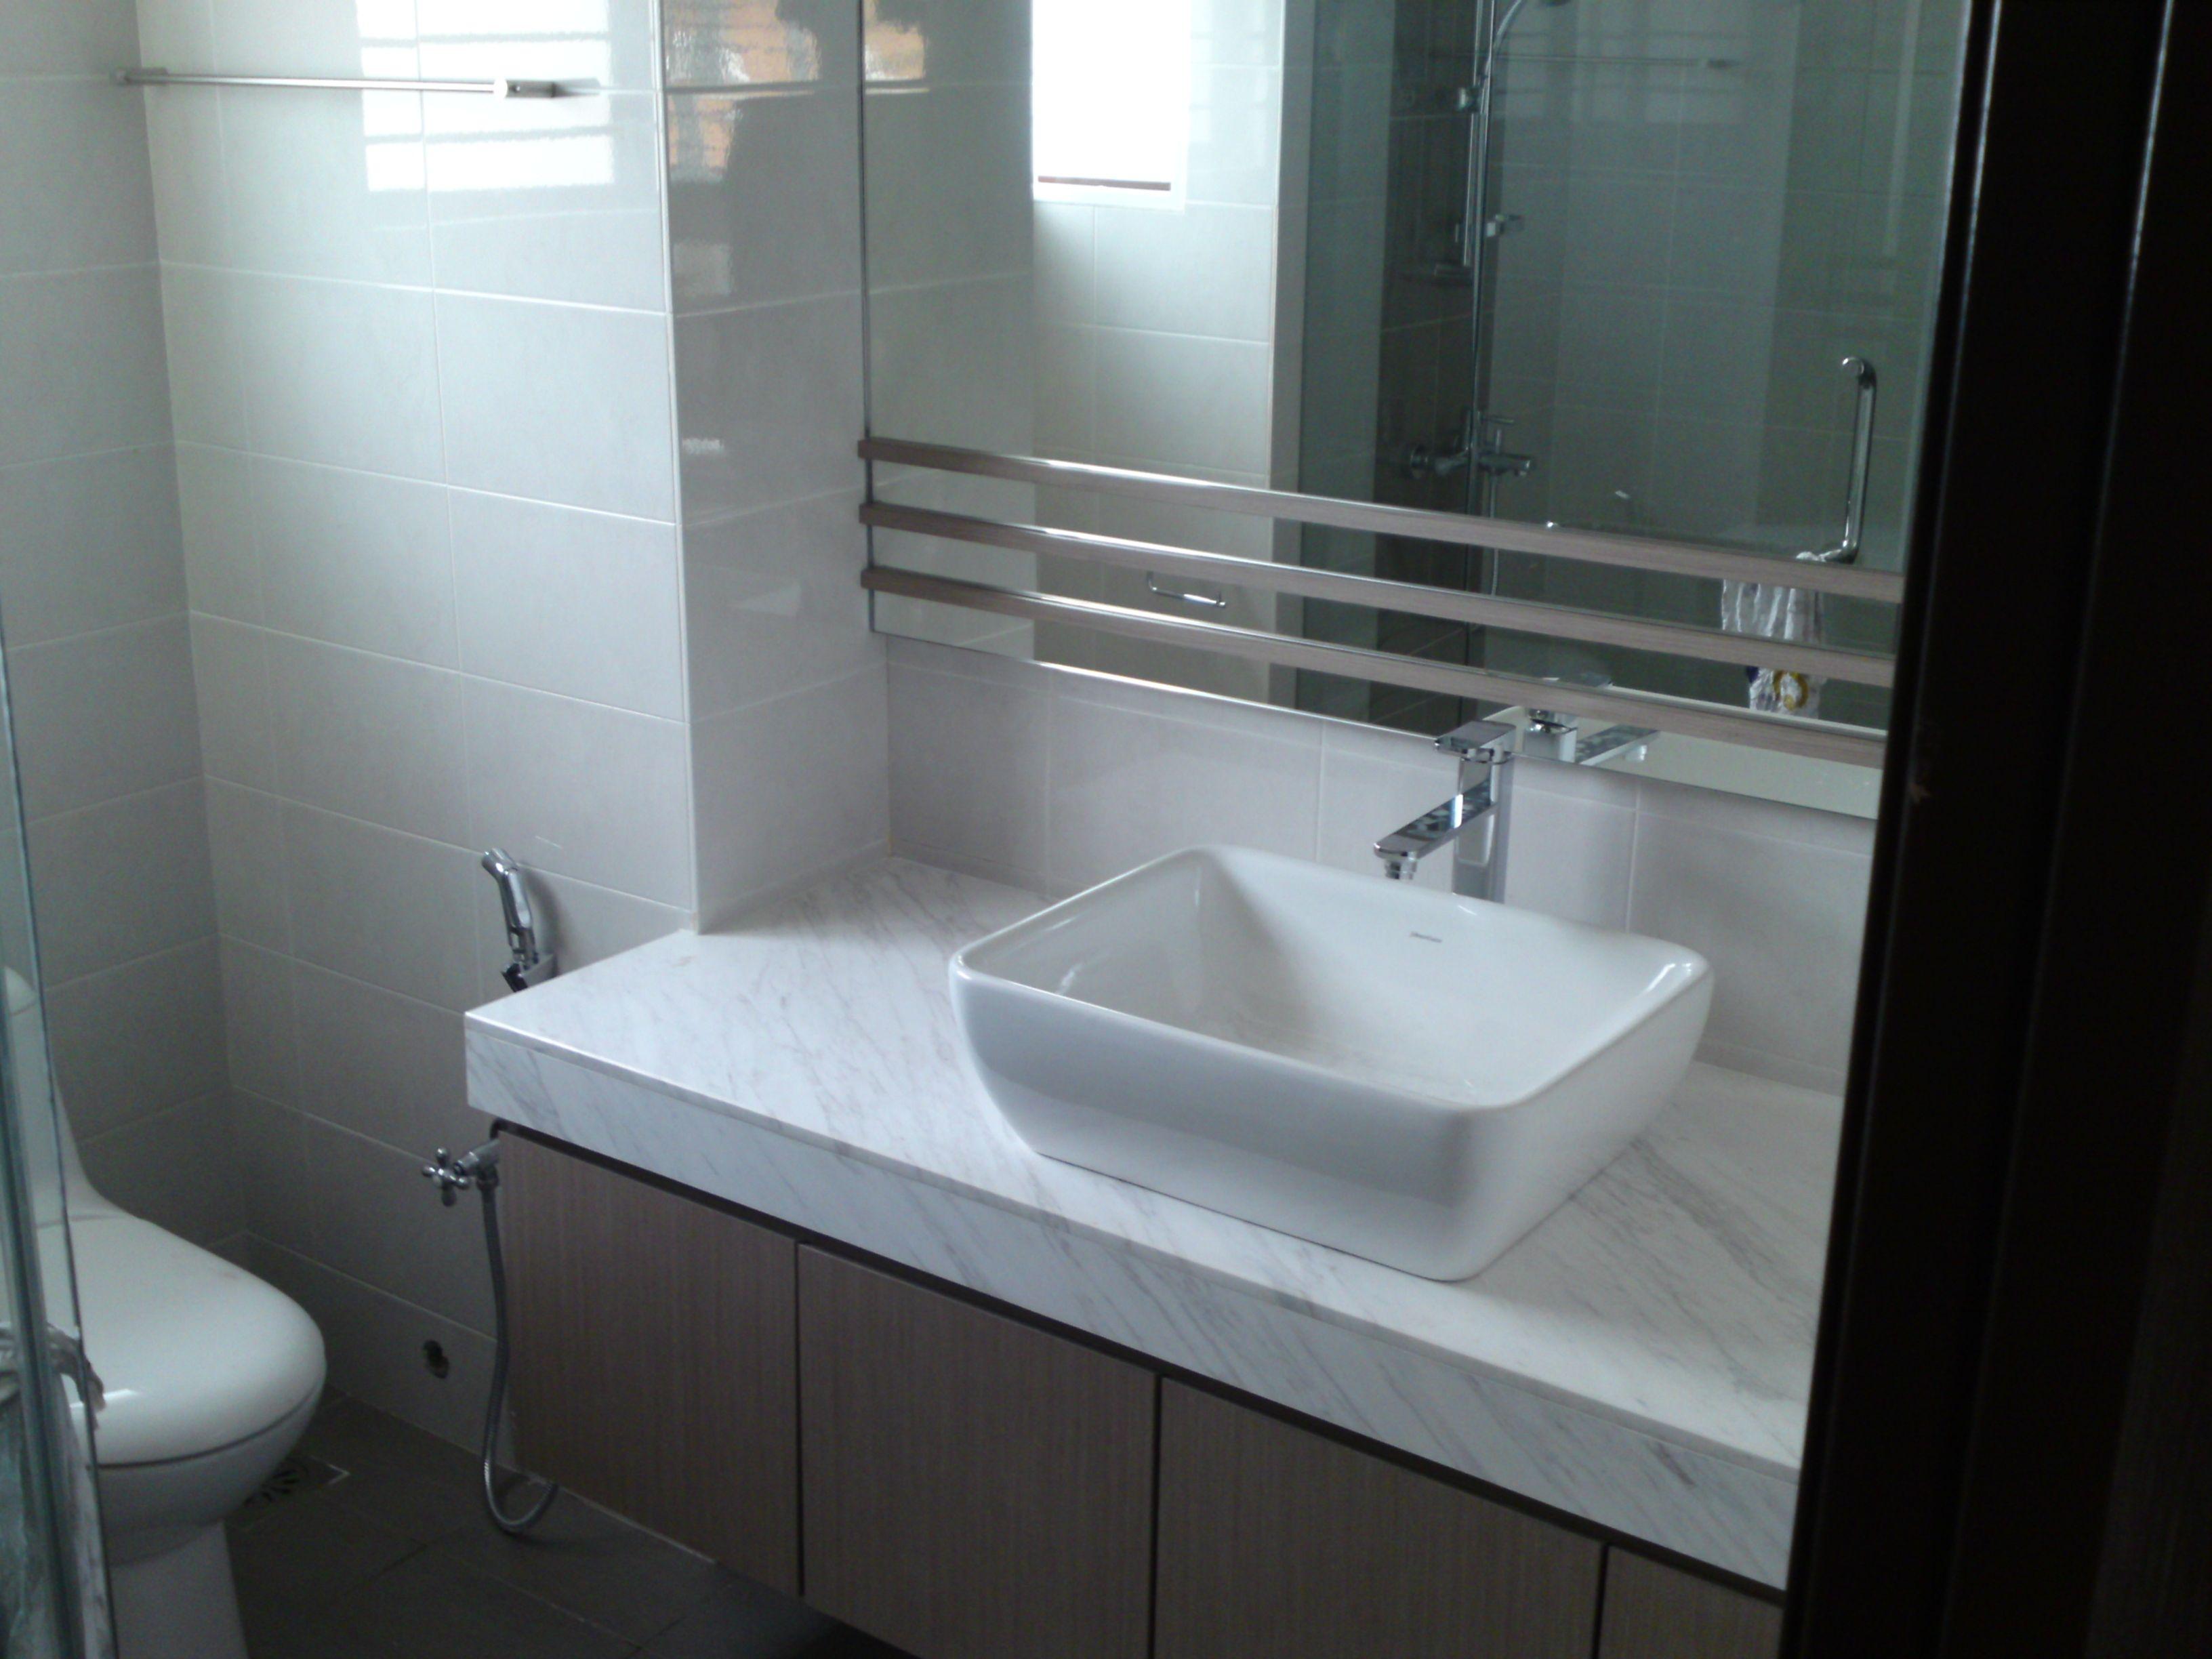 Latest Posts Under: Bathroom design ideas | bathroom design 2017 ...